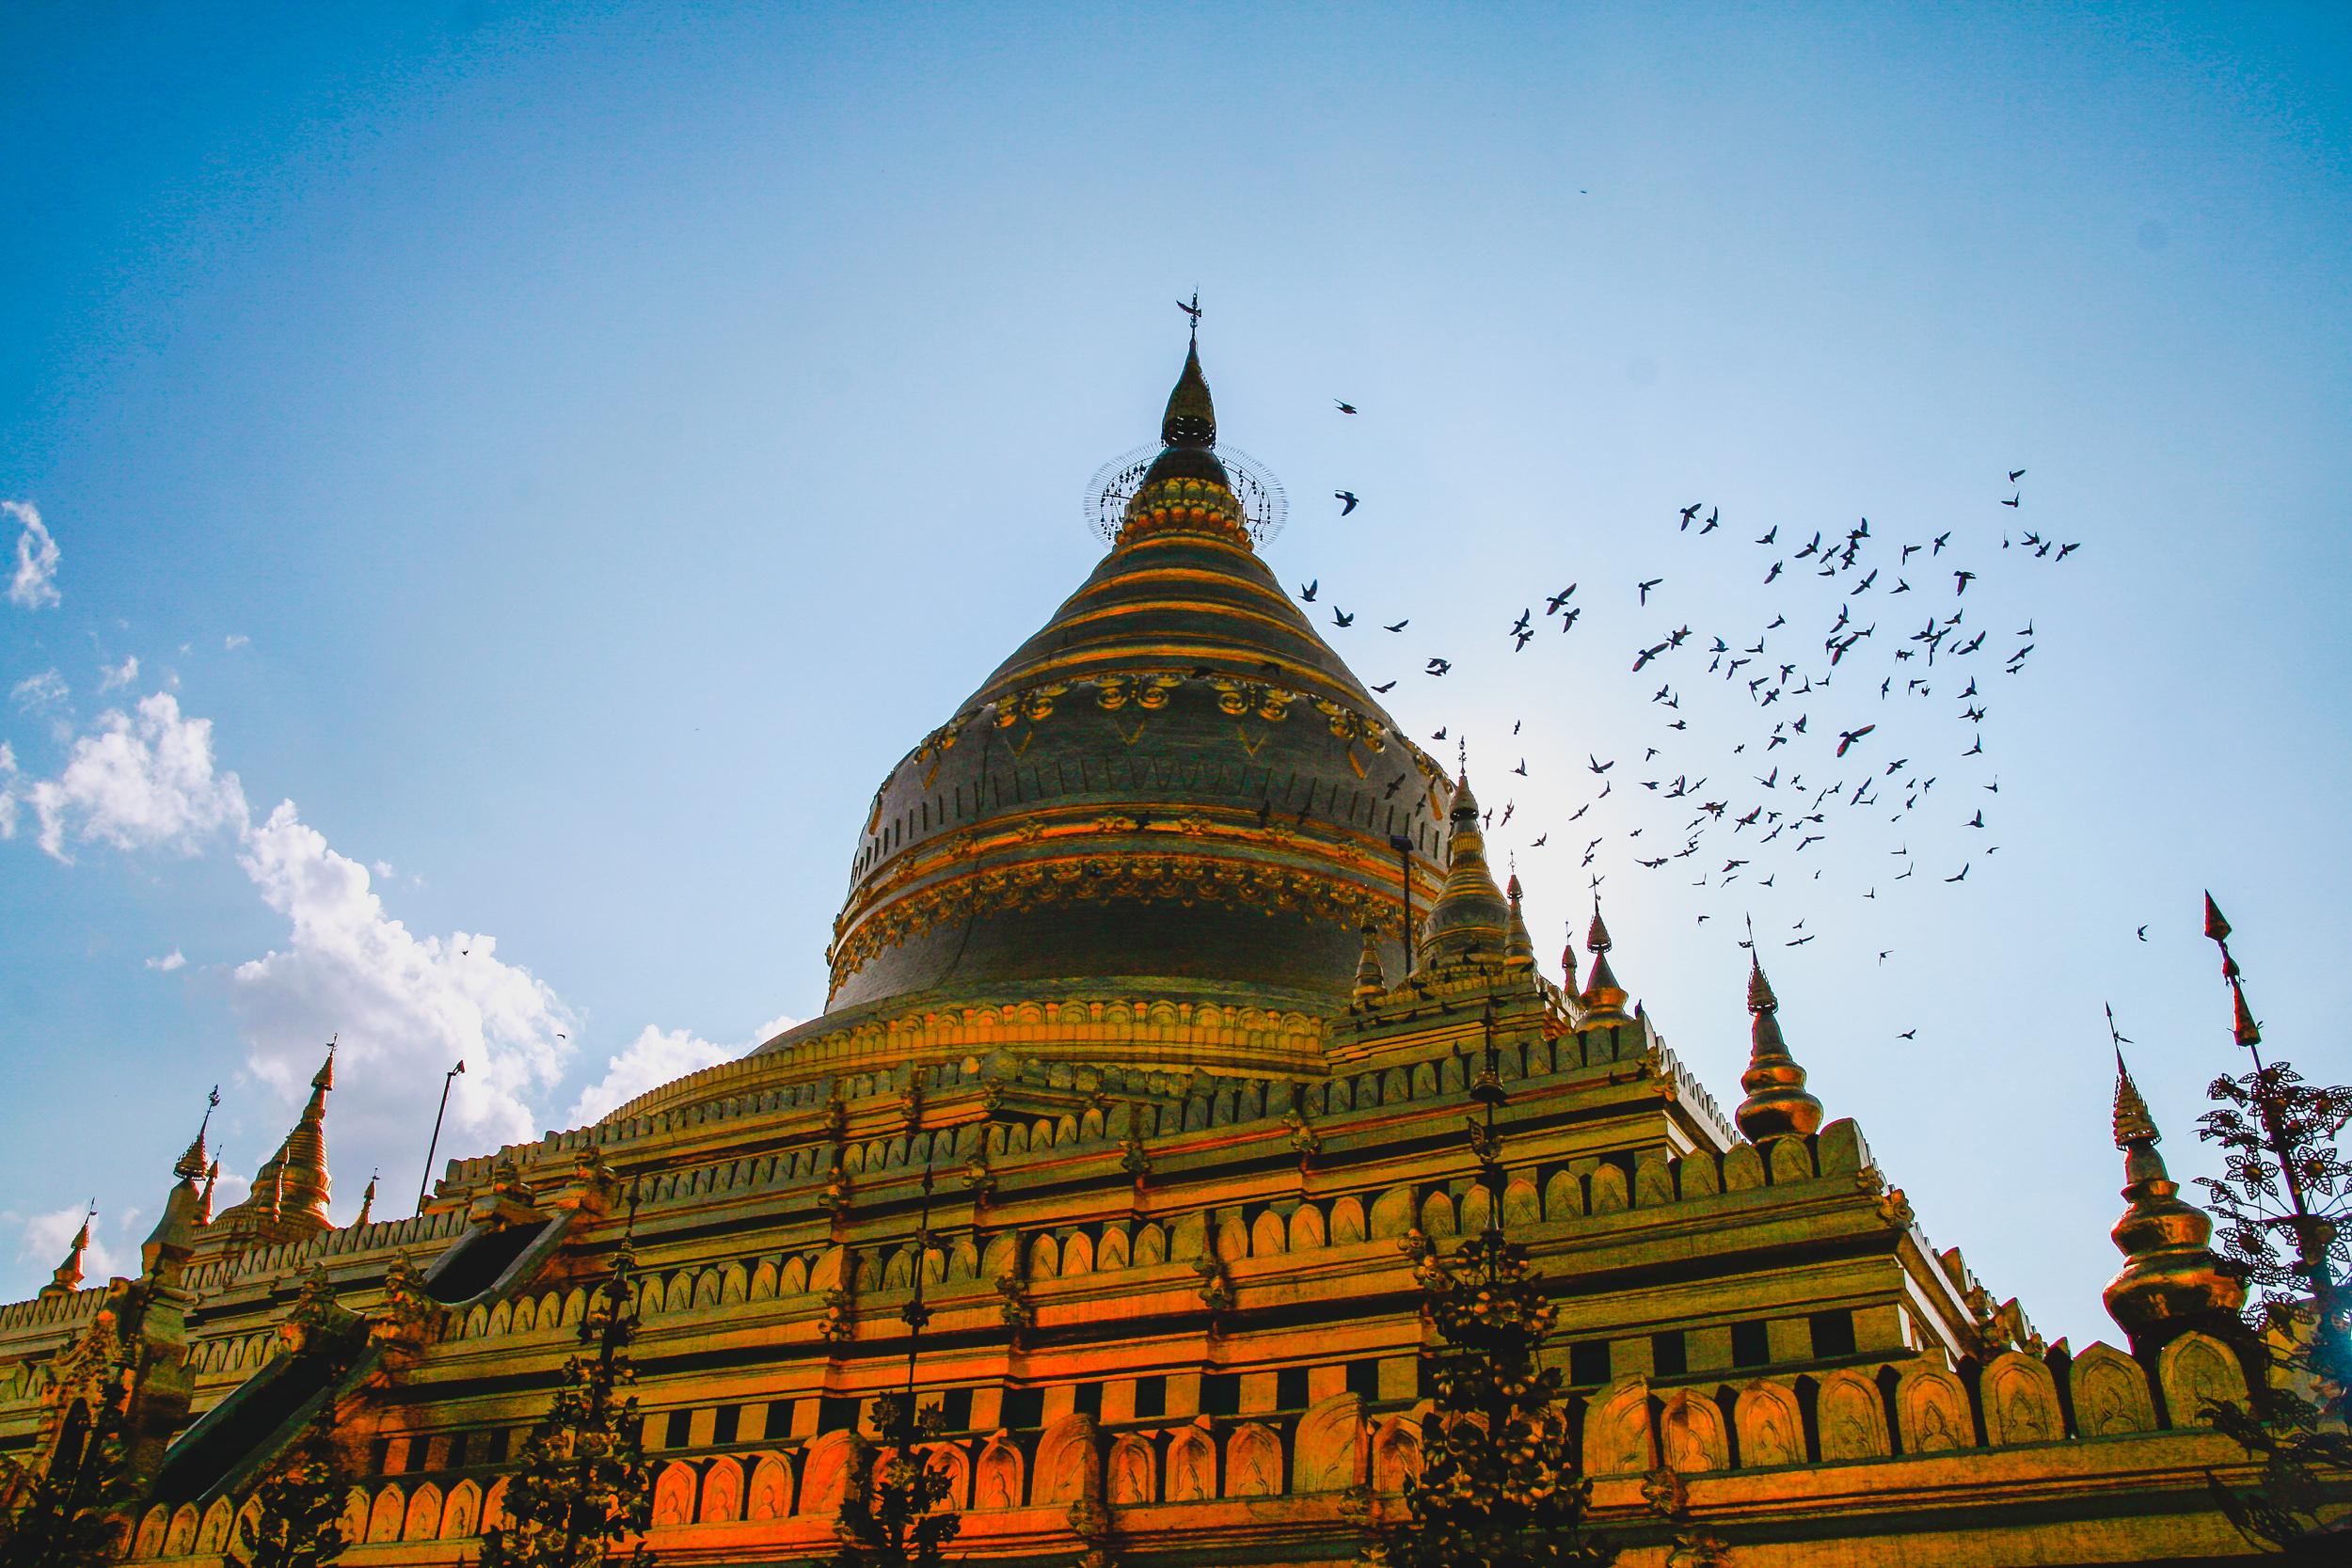 Golden Shwezigon Paya Bagan.jpg